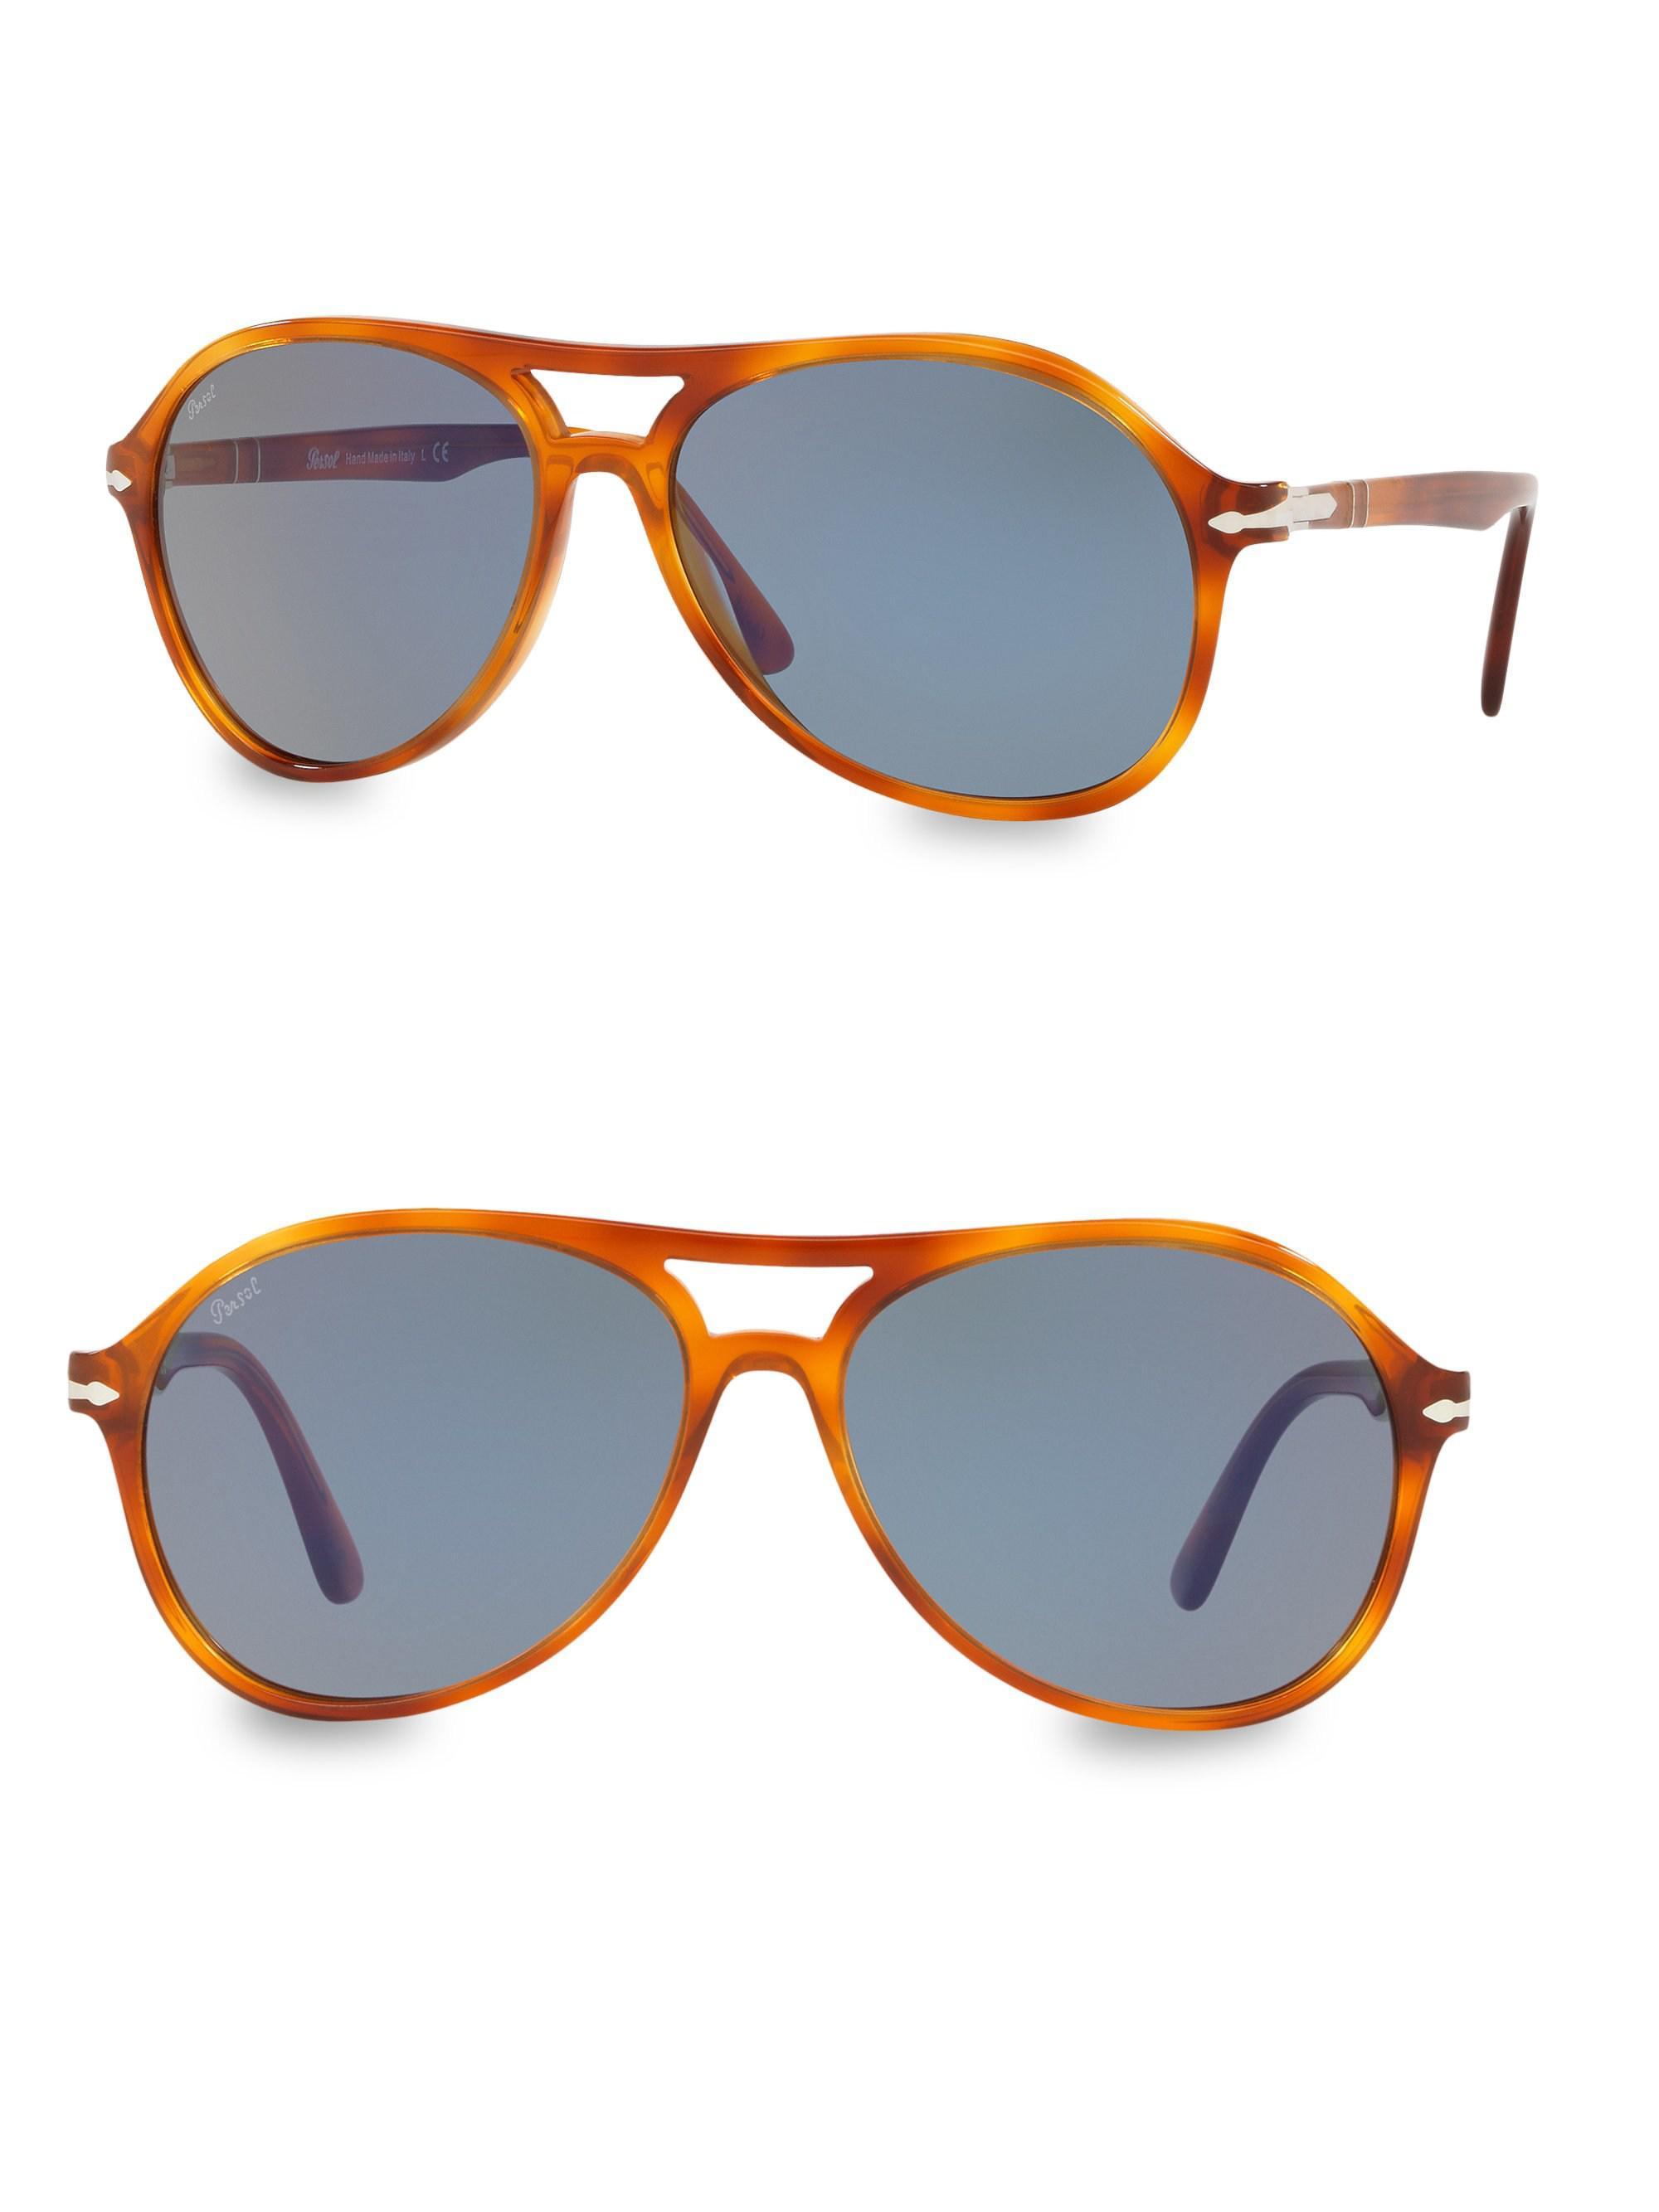 24063487292 Persol 59mm Solid Havana Sunglasses in Blue for Men - Lyst